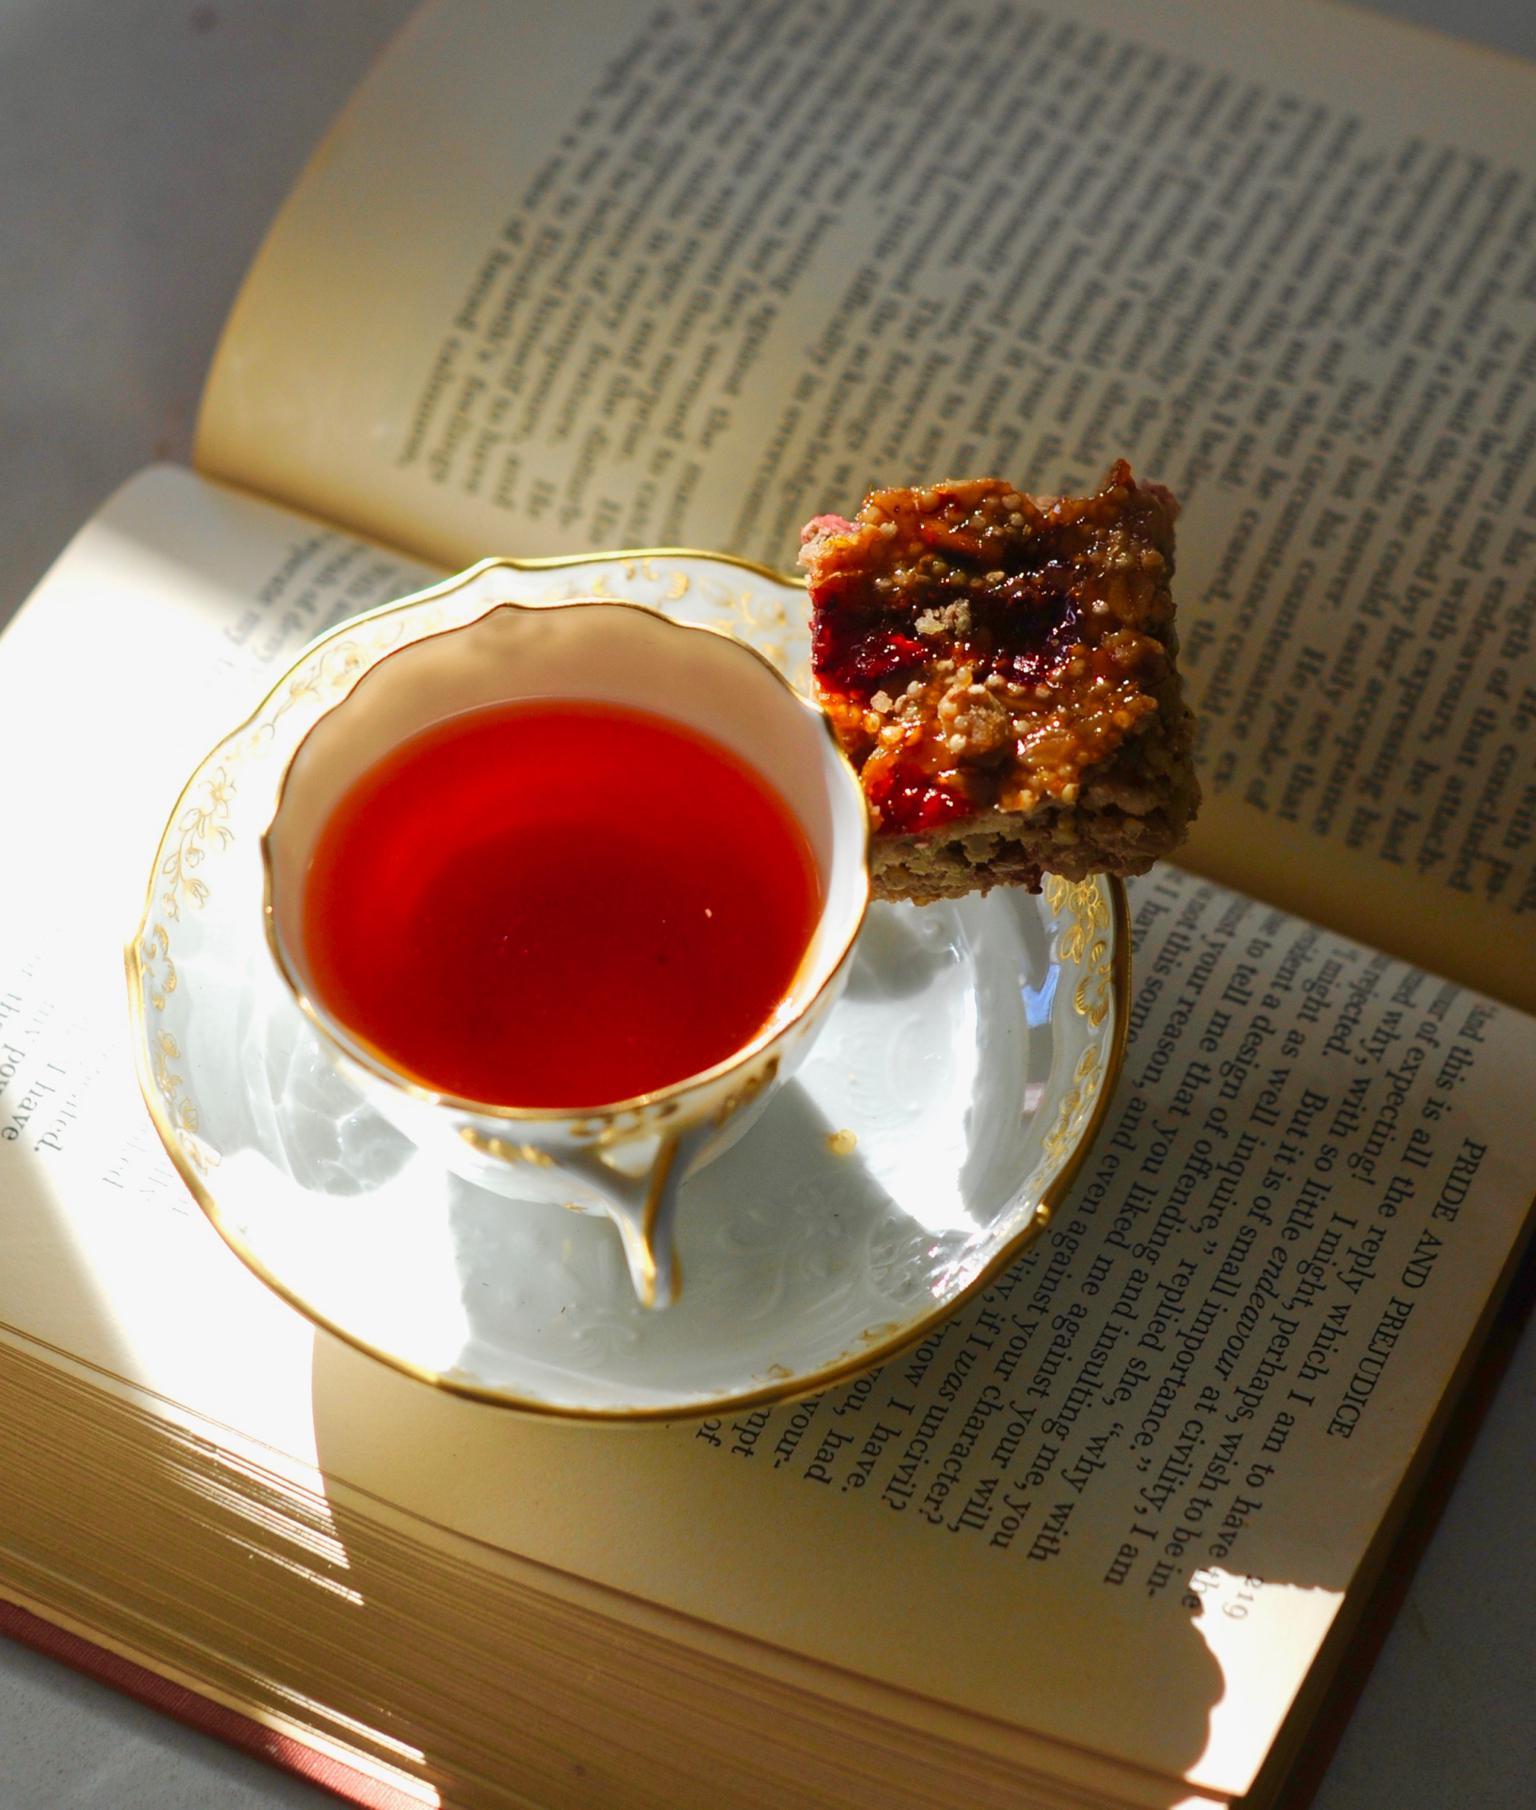 Healthy Strawberries and Cream Granola Bars, Vegan, GF and a book